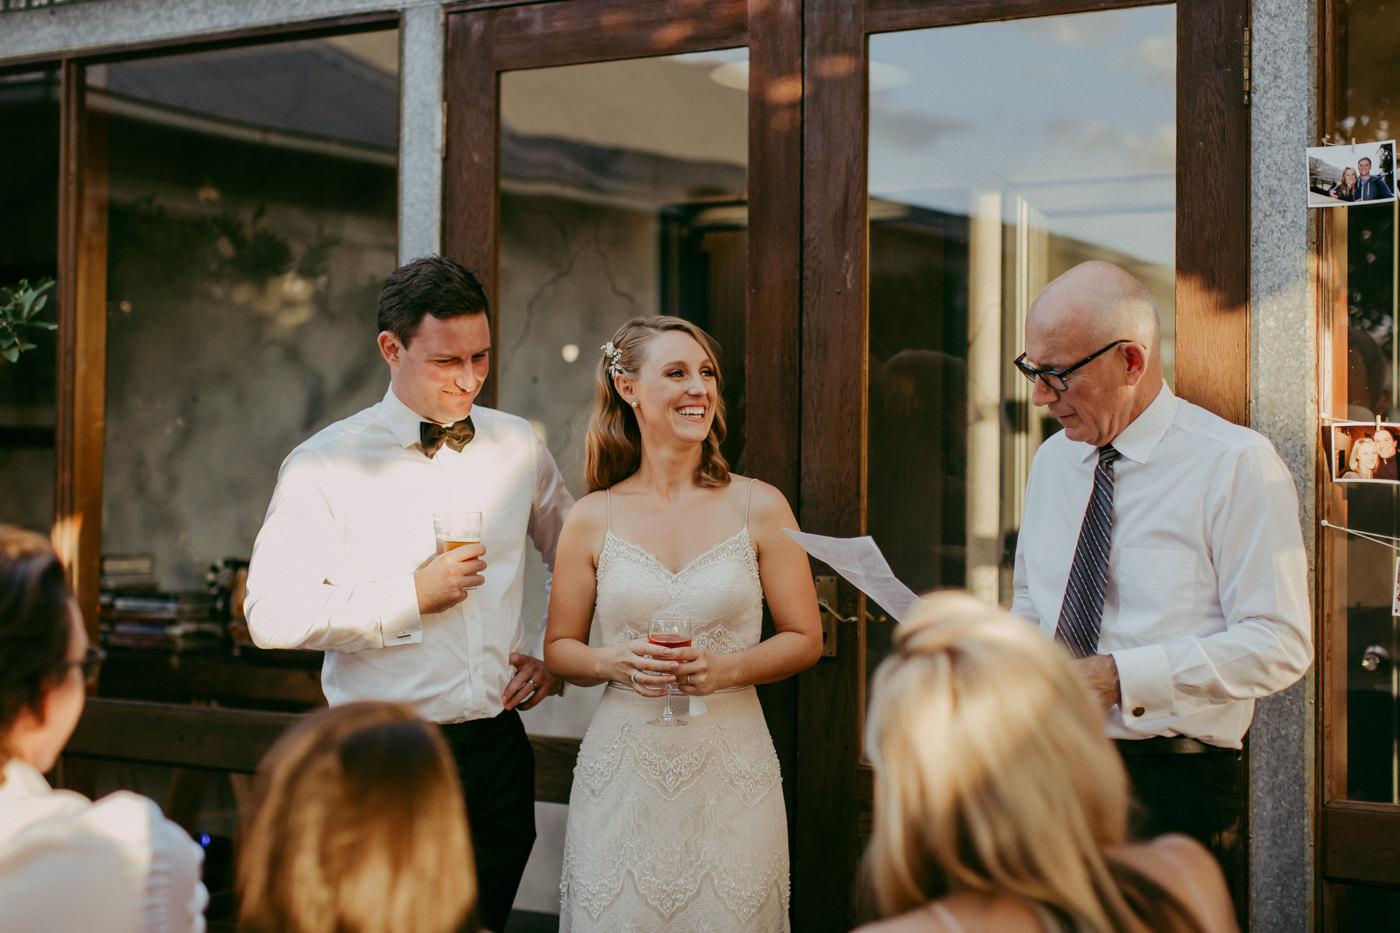 Anthony & Eliet - Wagga Wagga Wedding - Country NSW - Samantha Heather Photography-141.jpg